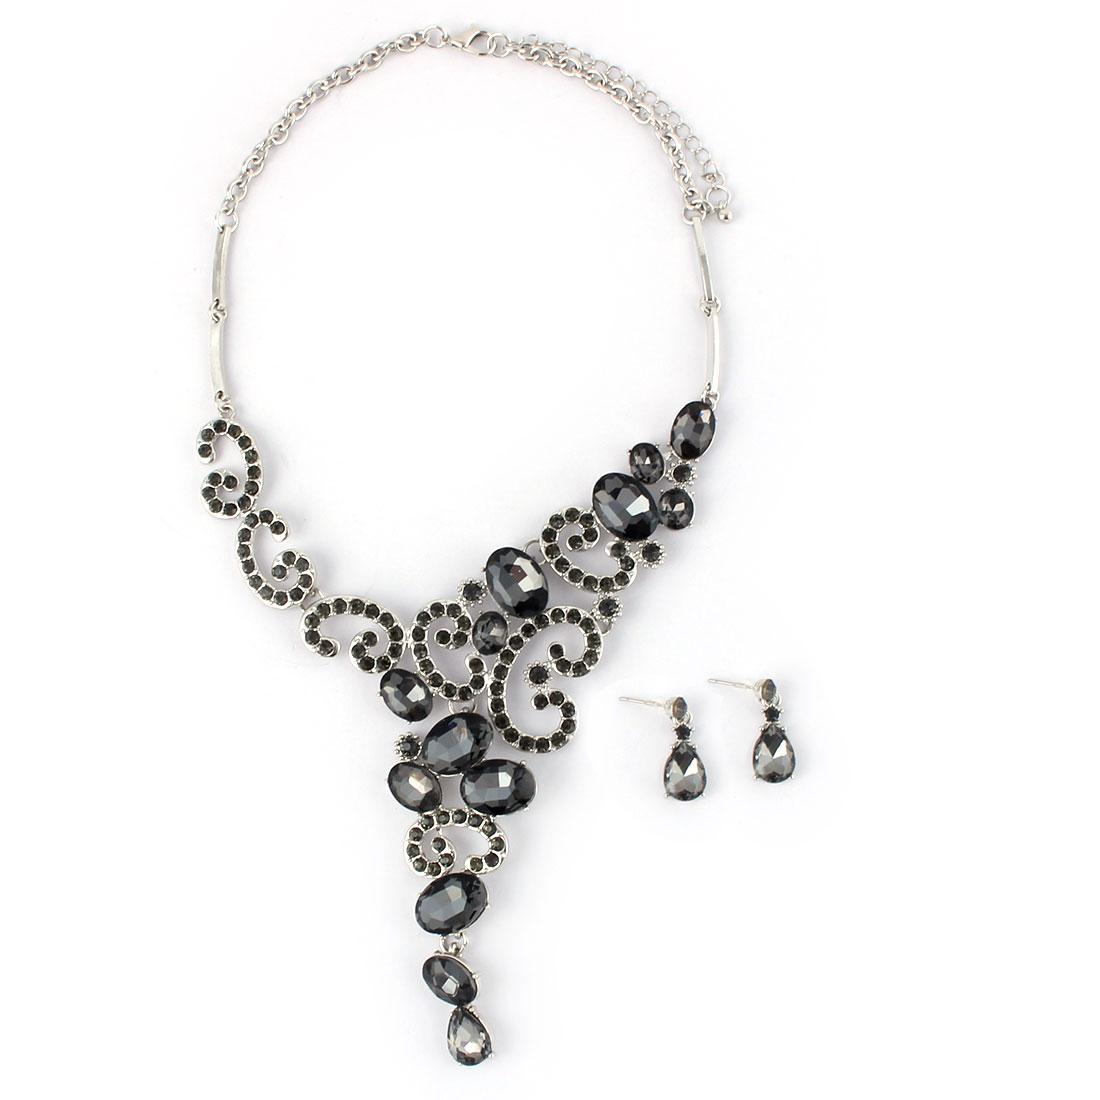 Women Metal Faux Rhinestone Inlaid Pendant Bib Collar Charming Necklace Earrings Black Set